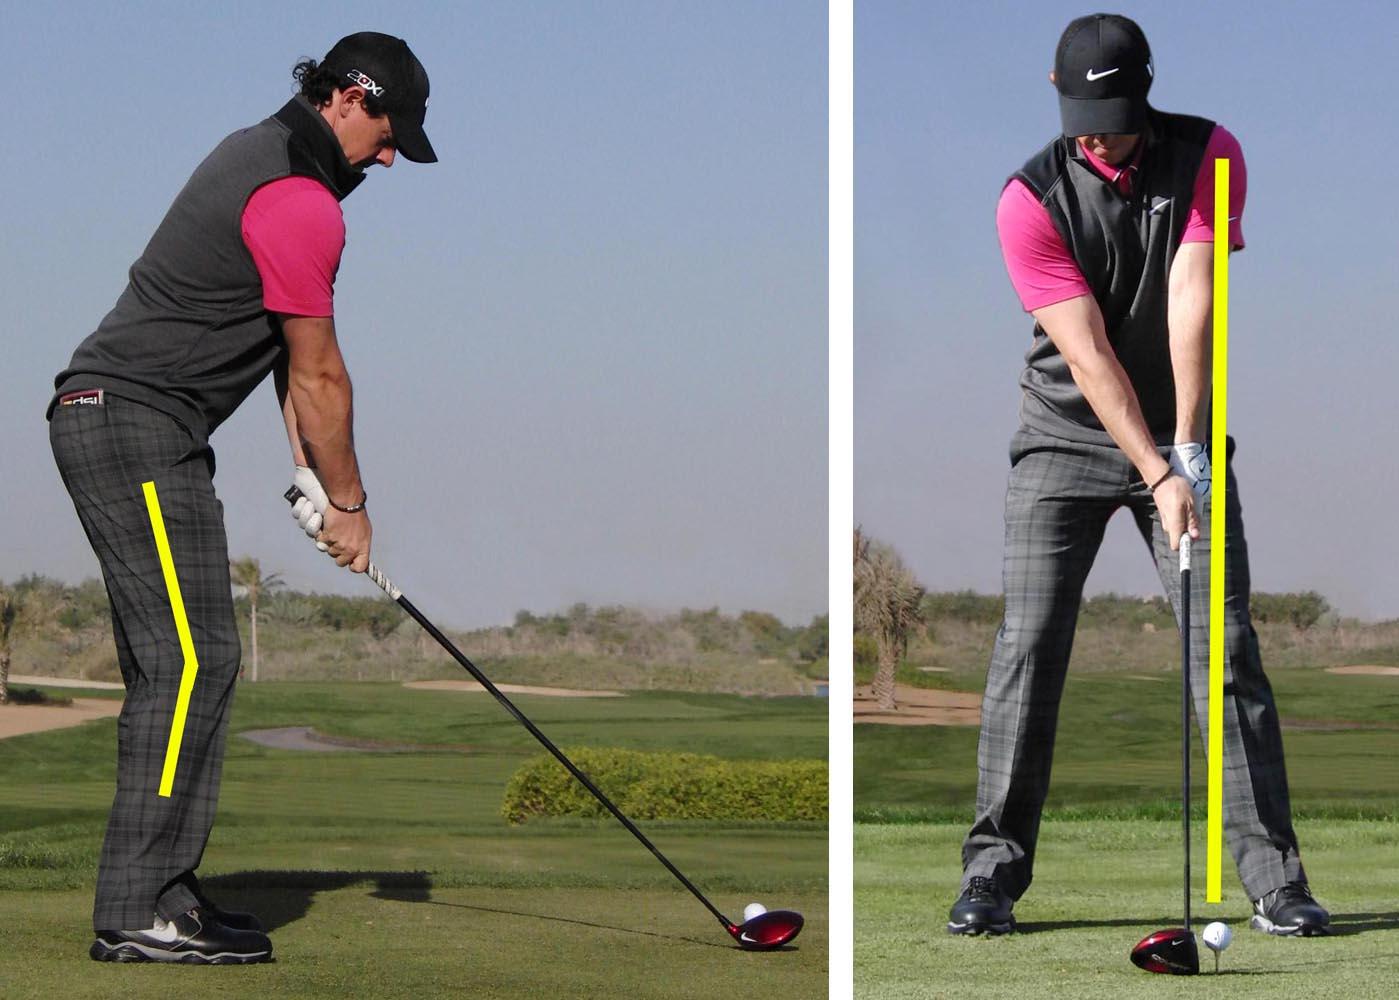 http://www.golfmagic.com/sites/default/files/field/image/28192_0.jpg